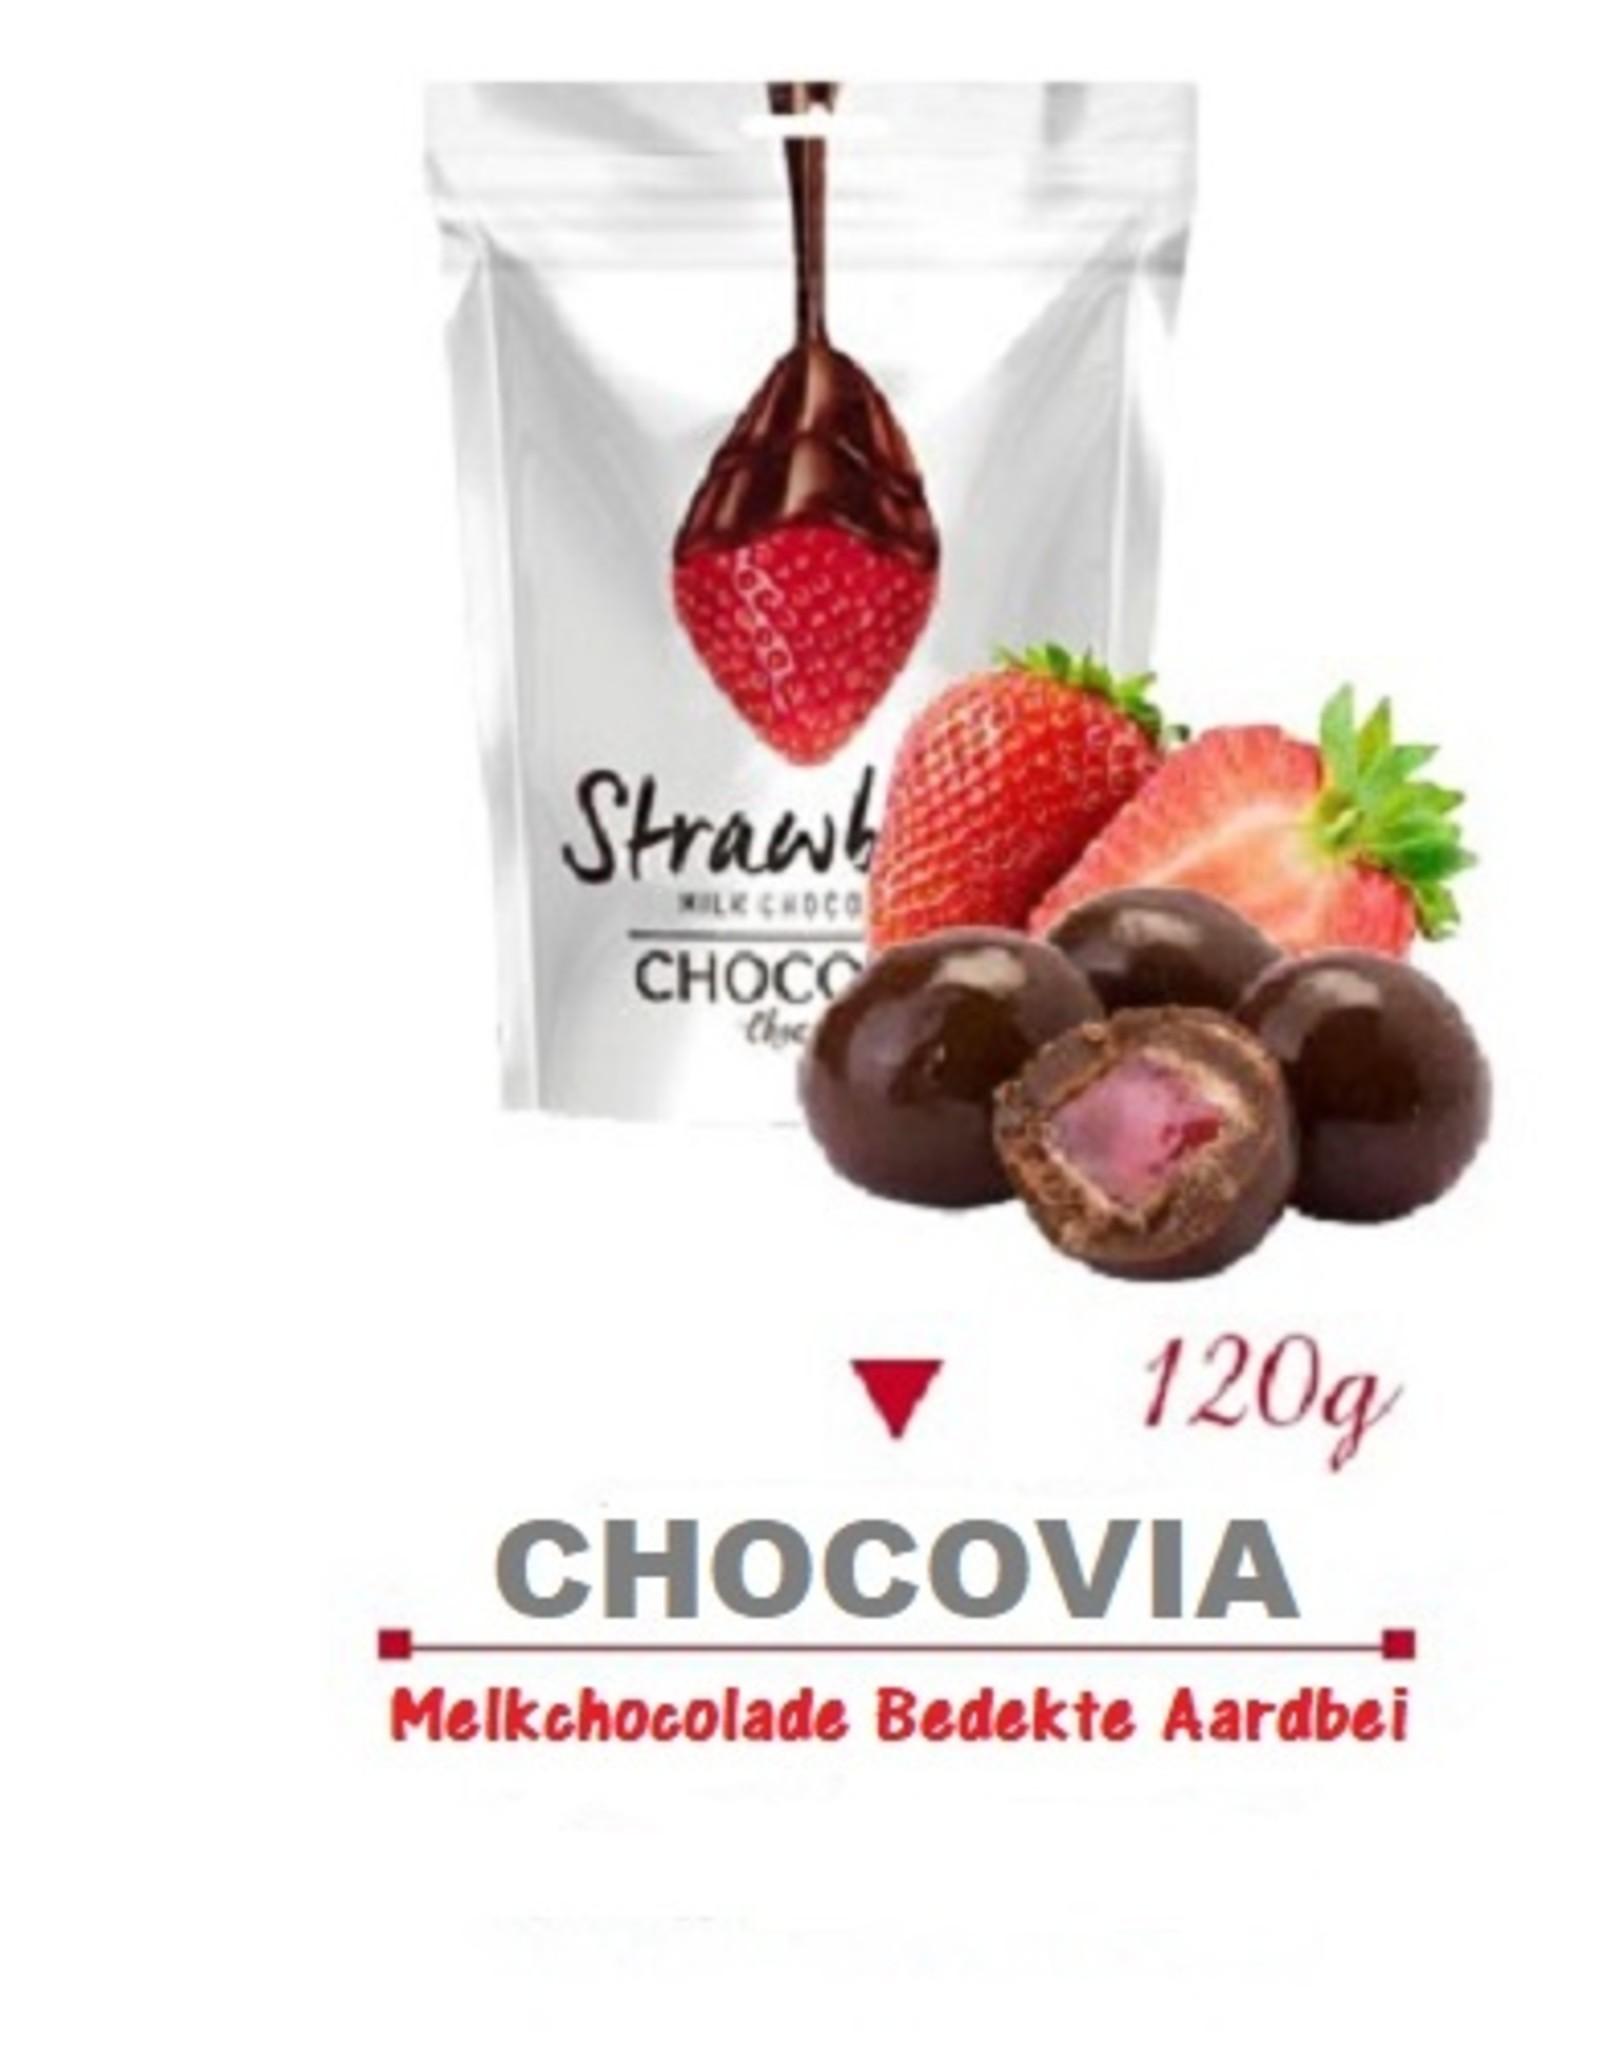 Chocovia  Chocovia Aardbeien melkchocolade 120g